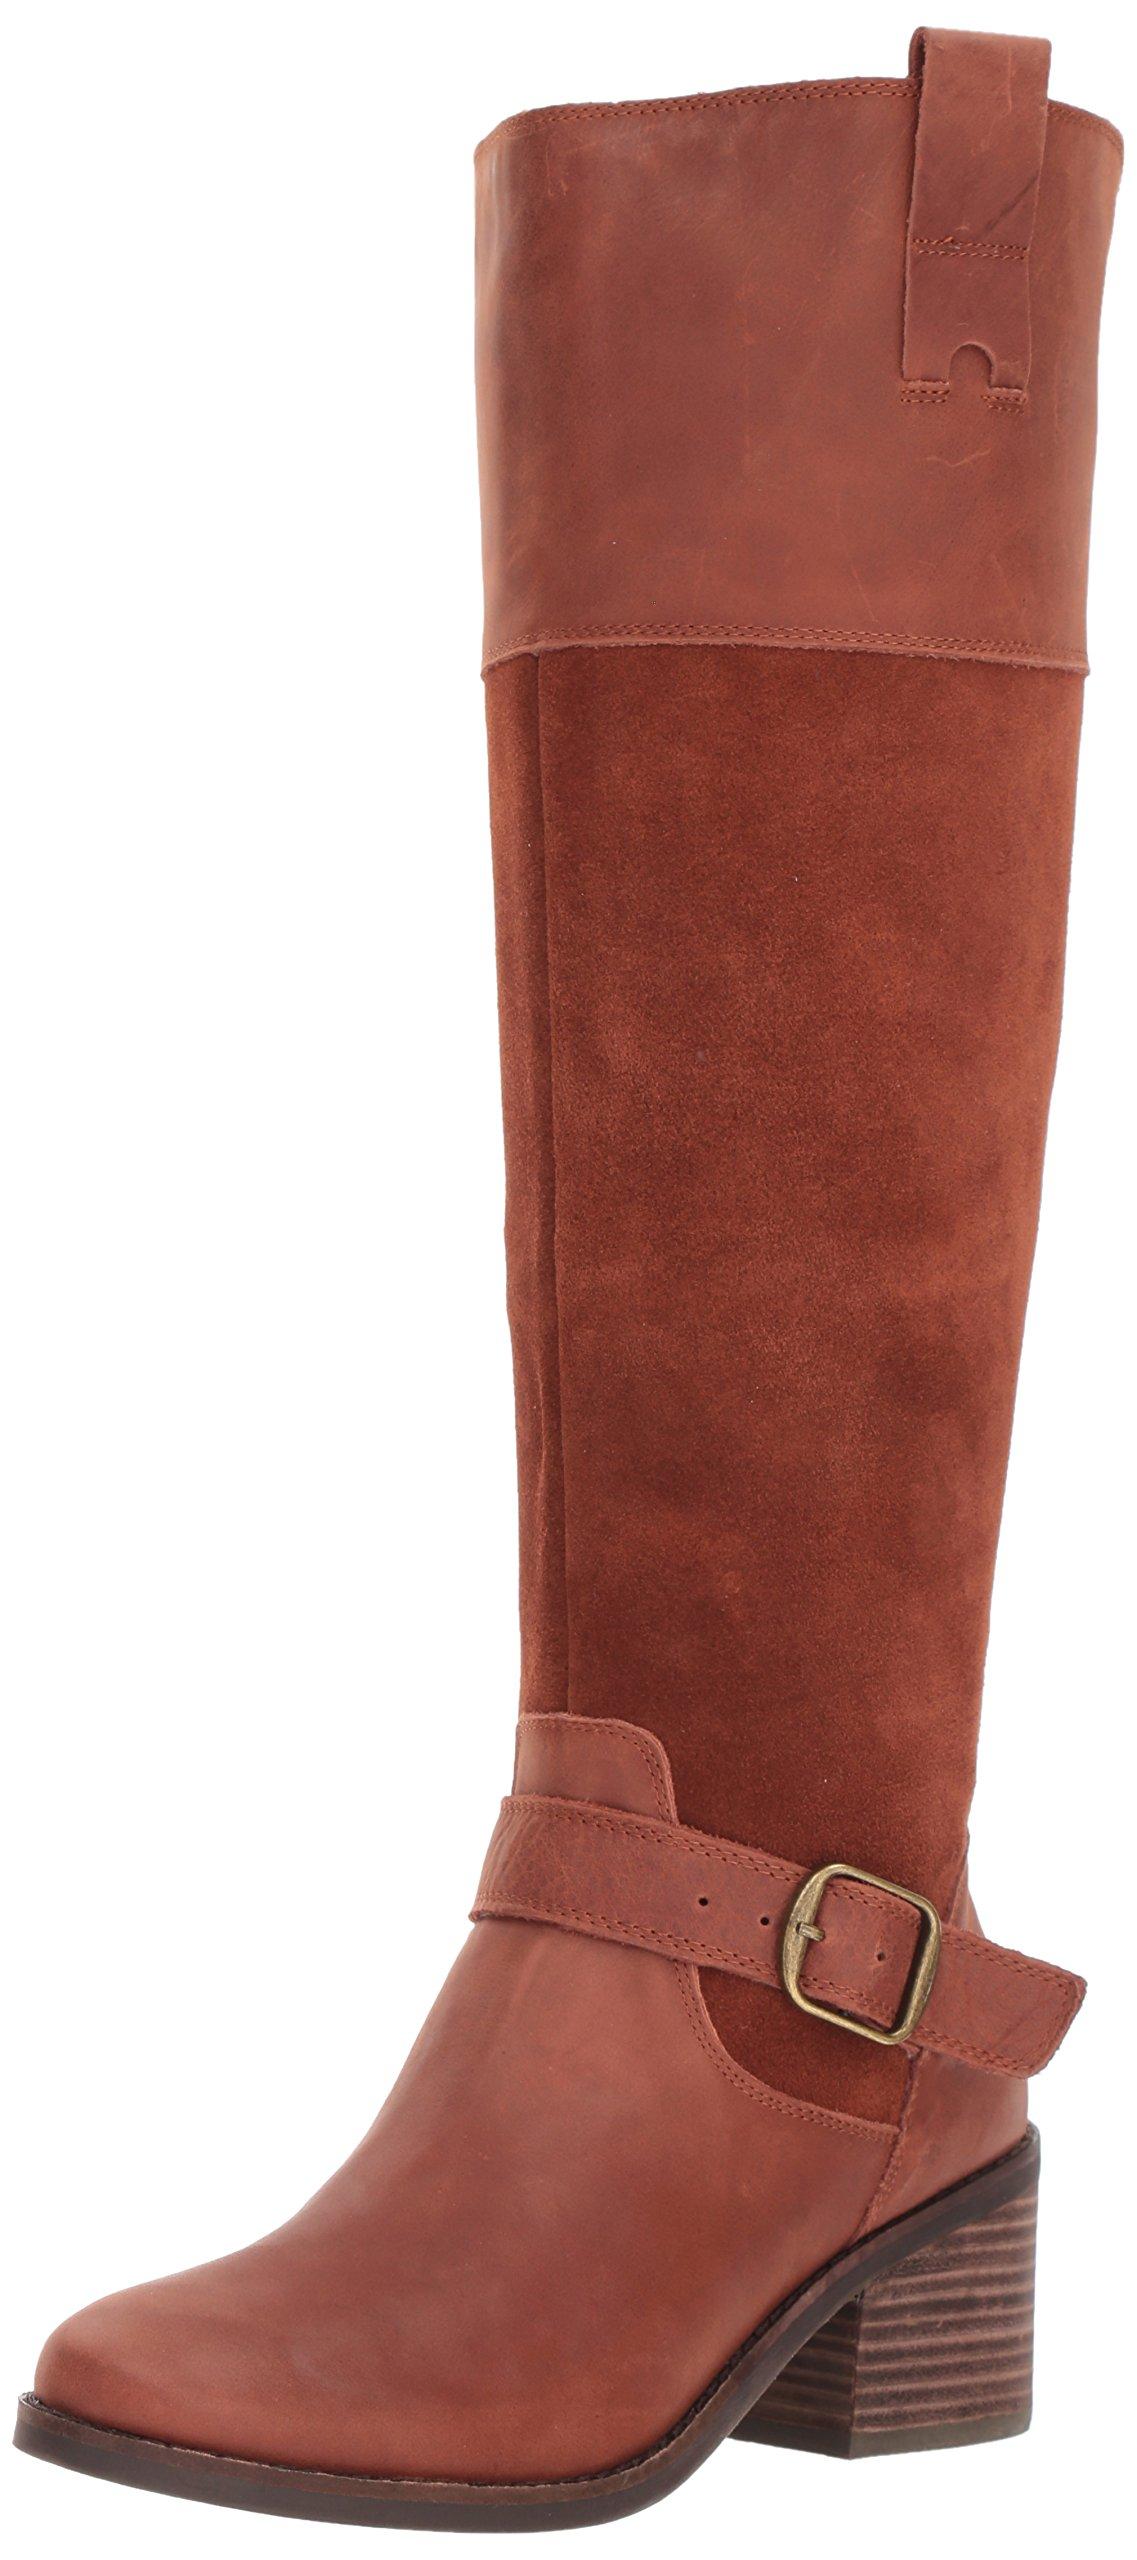 Lucky Brand Women's Kailan Equestrian Boot, Rye, 5.5 Medium US